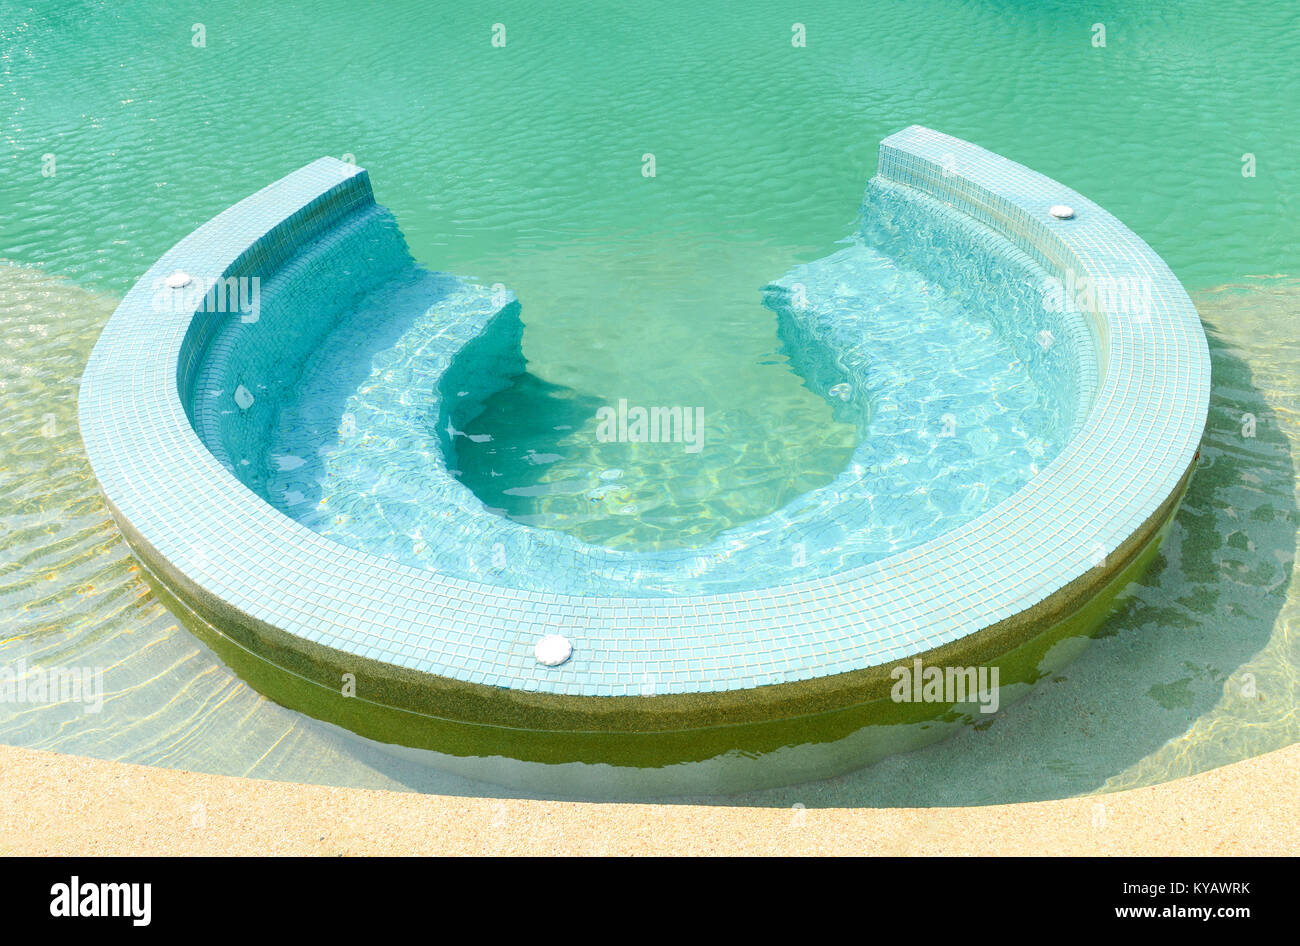 Piscina Con Jacuzzi Exterior.Jacuzzi Exterior Piscina Azul Vacaciones De Verano Foto